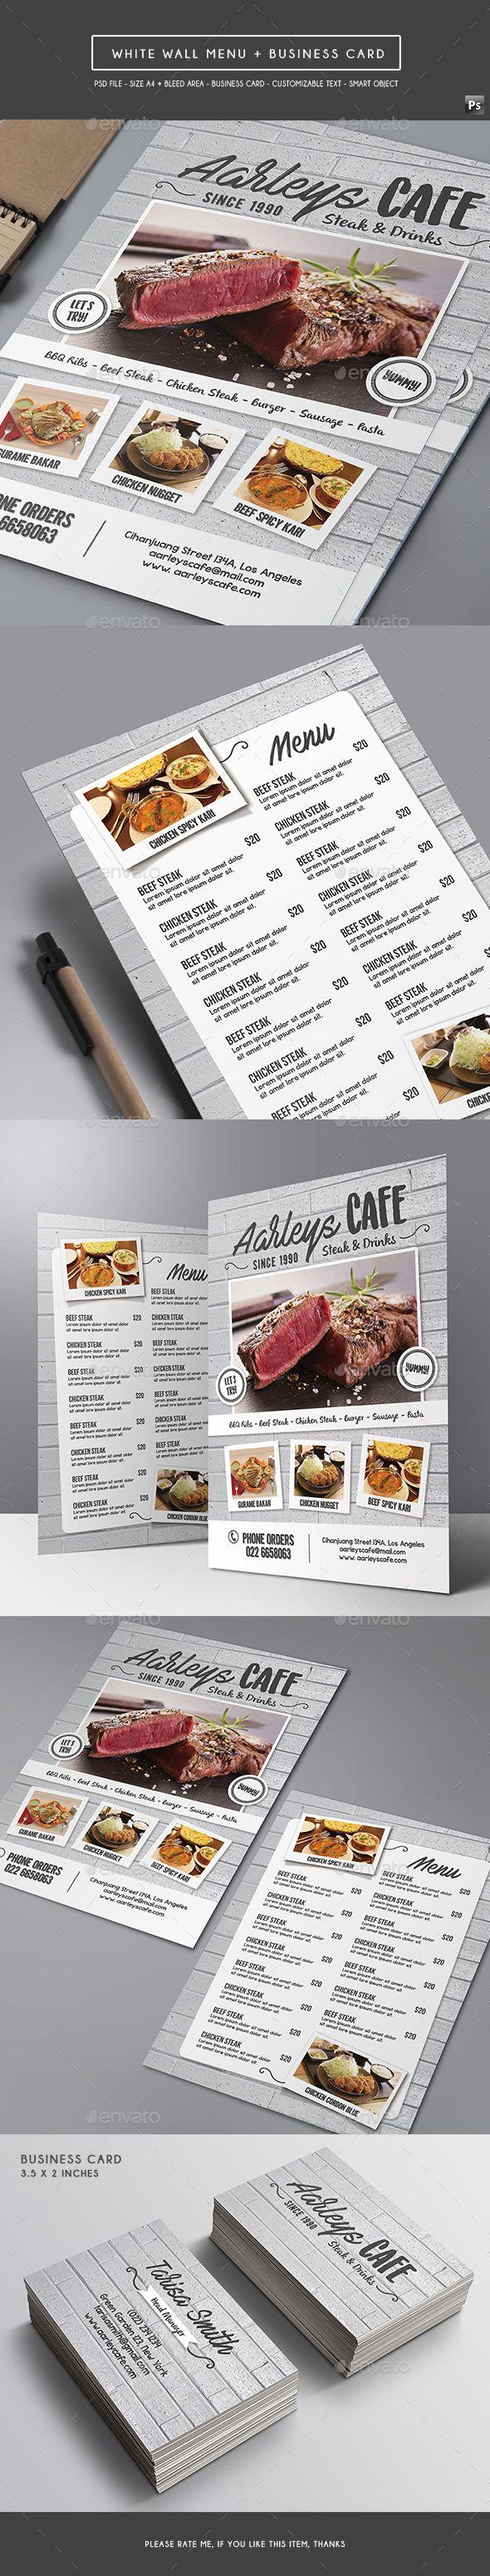 White Wall Menu | Restaurante y Empresas